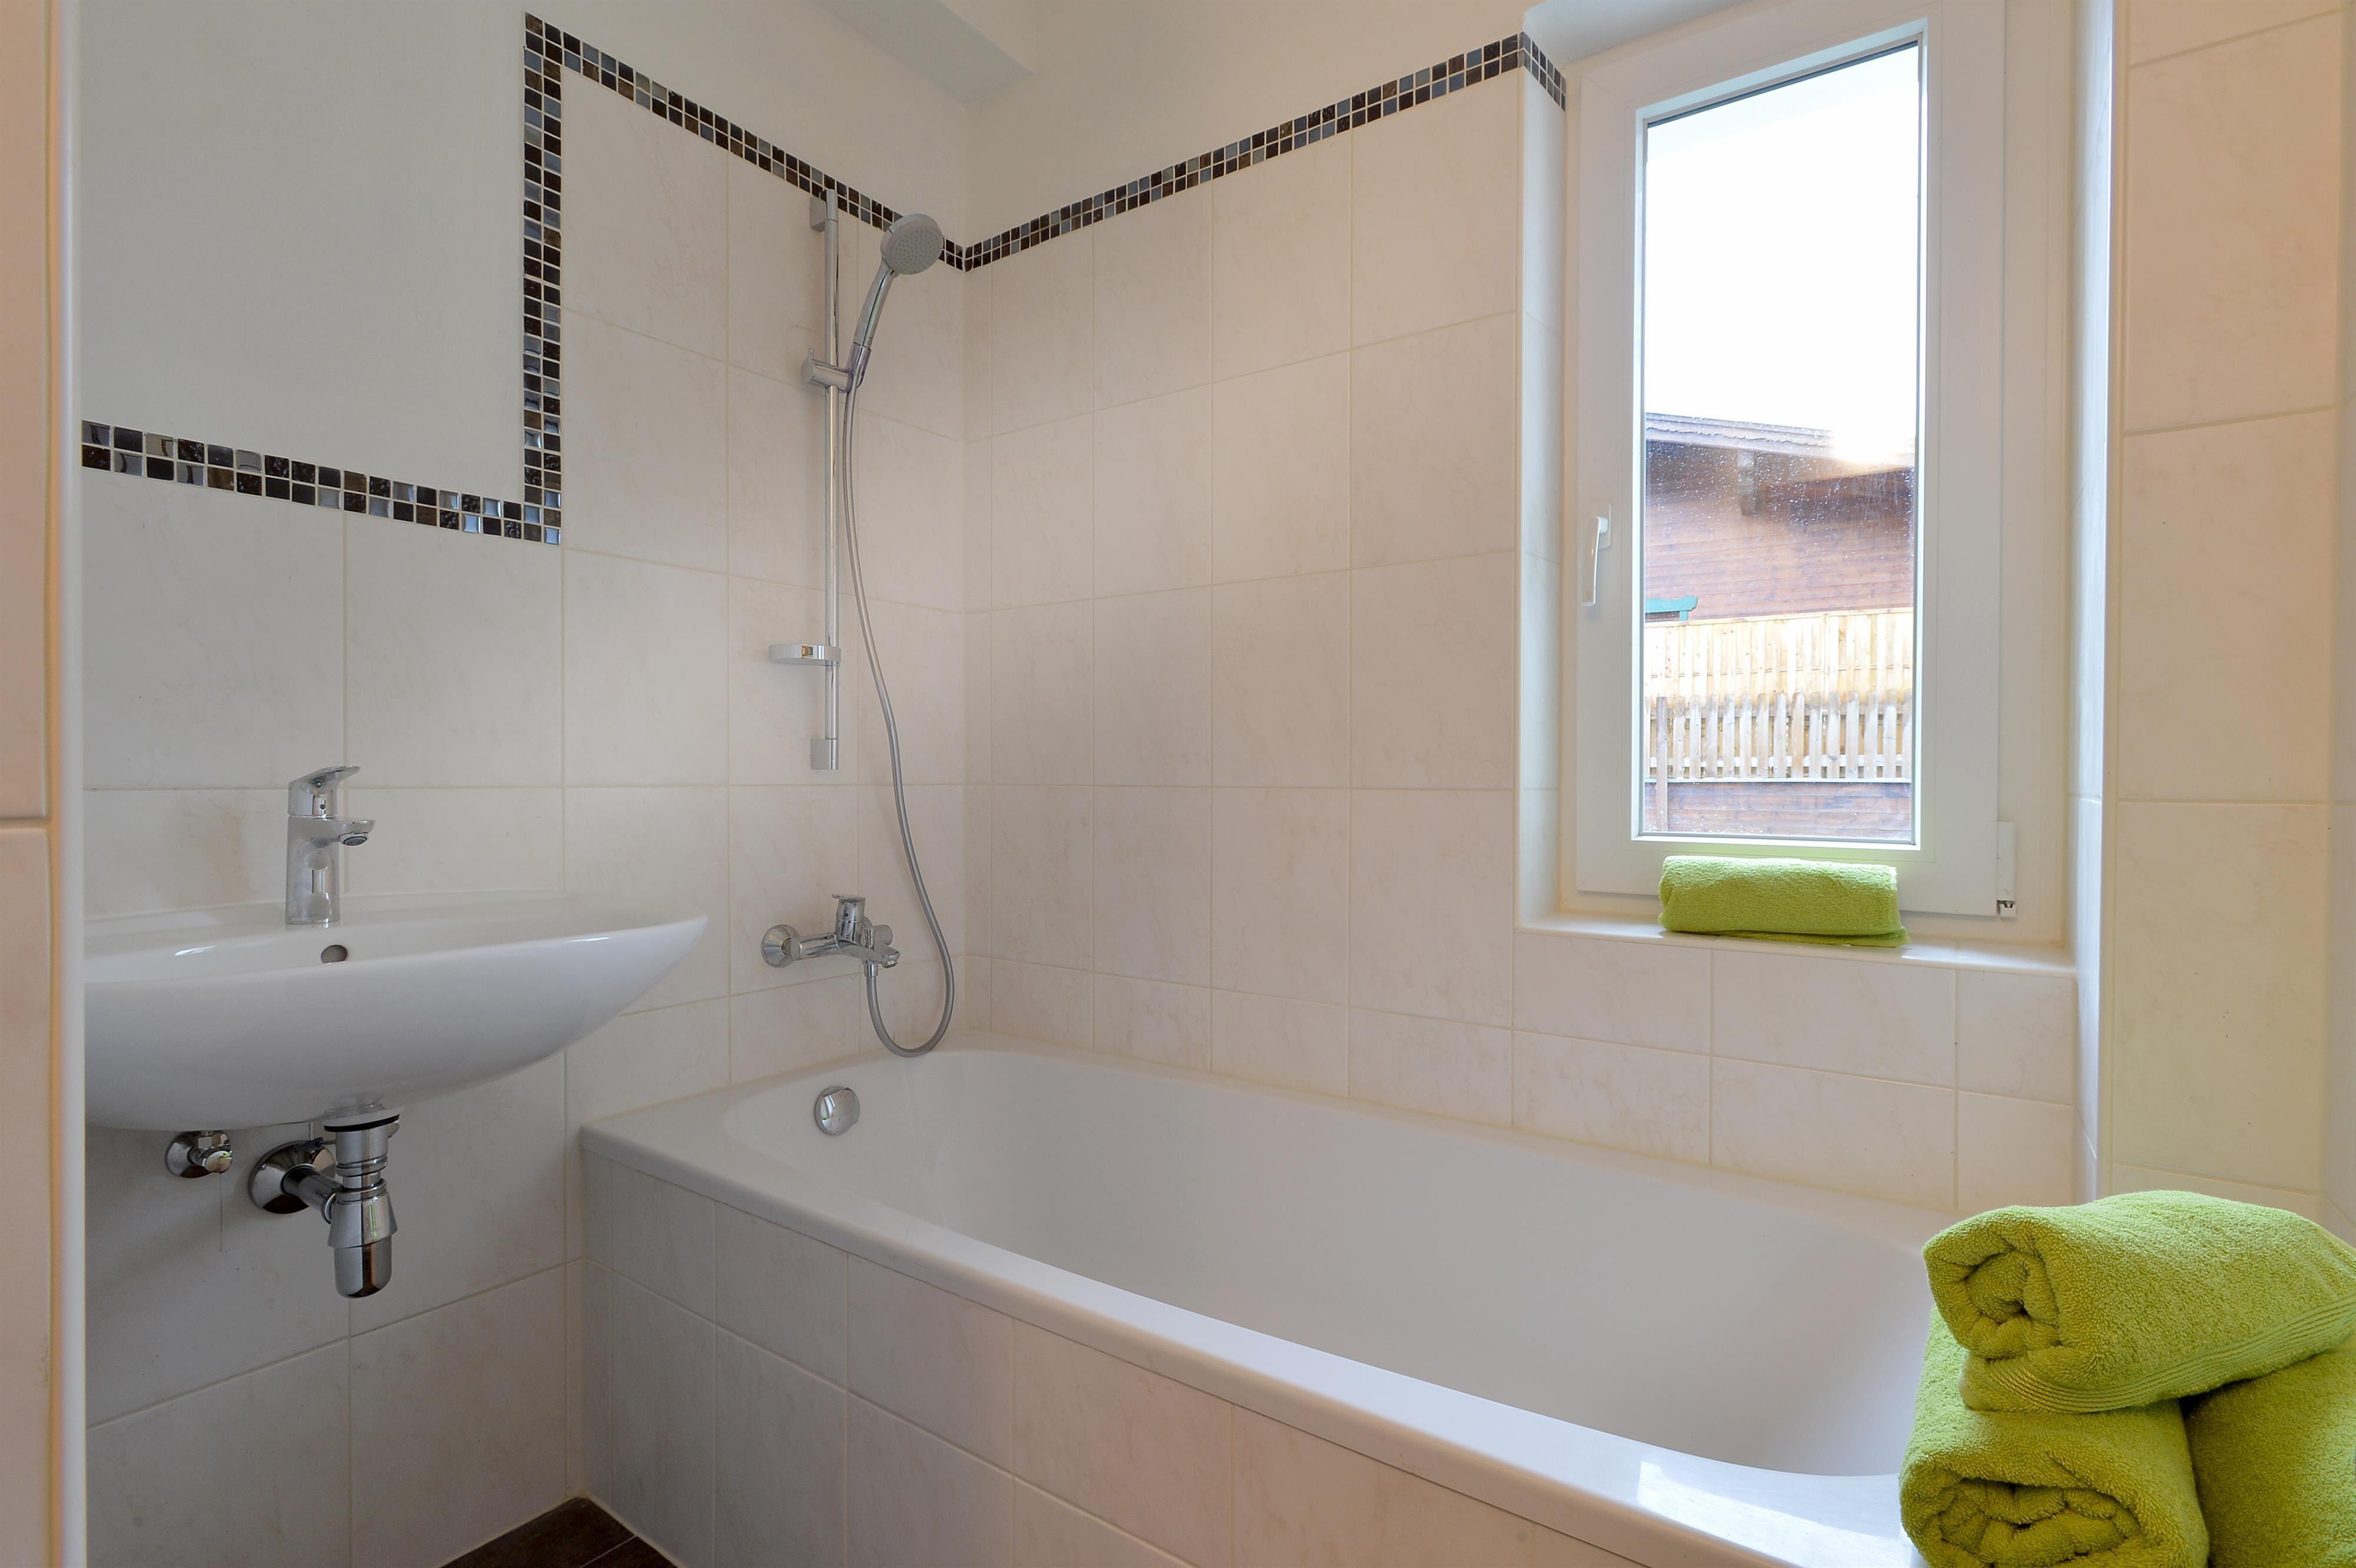 badezimmer komplett preise badezimmer komplett fliesen er set xxl angebot zehnder yucca plus. Black Bedroom Furniture Sets. Home Design Ideas